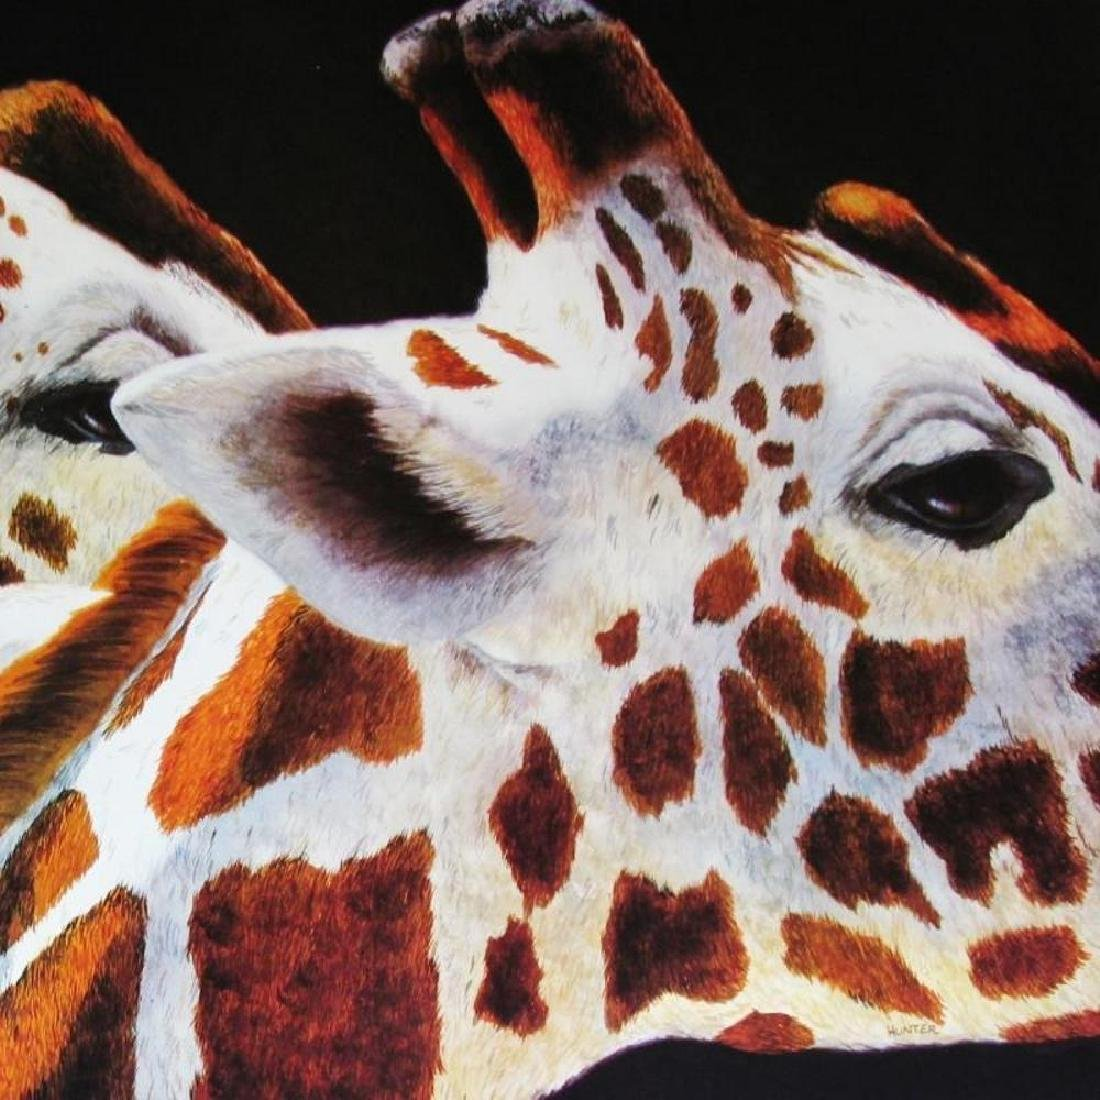 Giraff Abstract Modern Realism Poster - 3